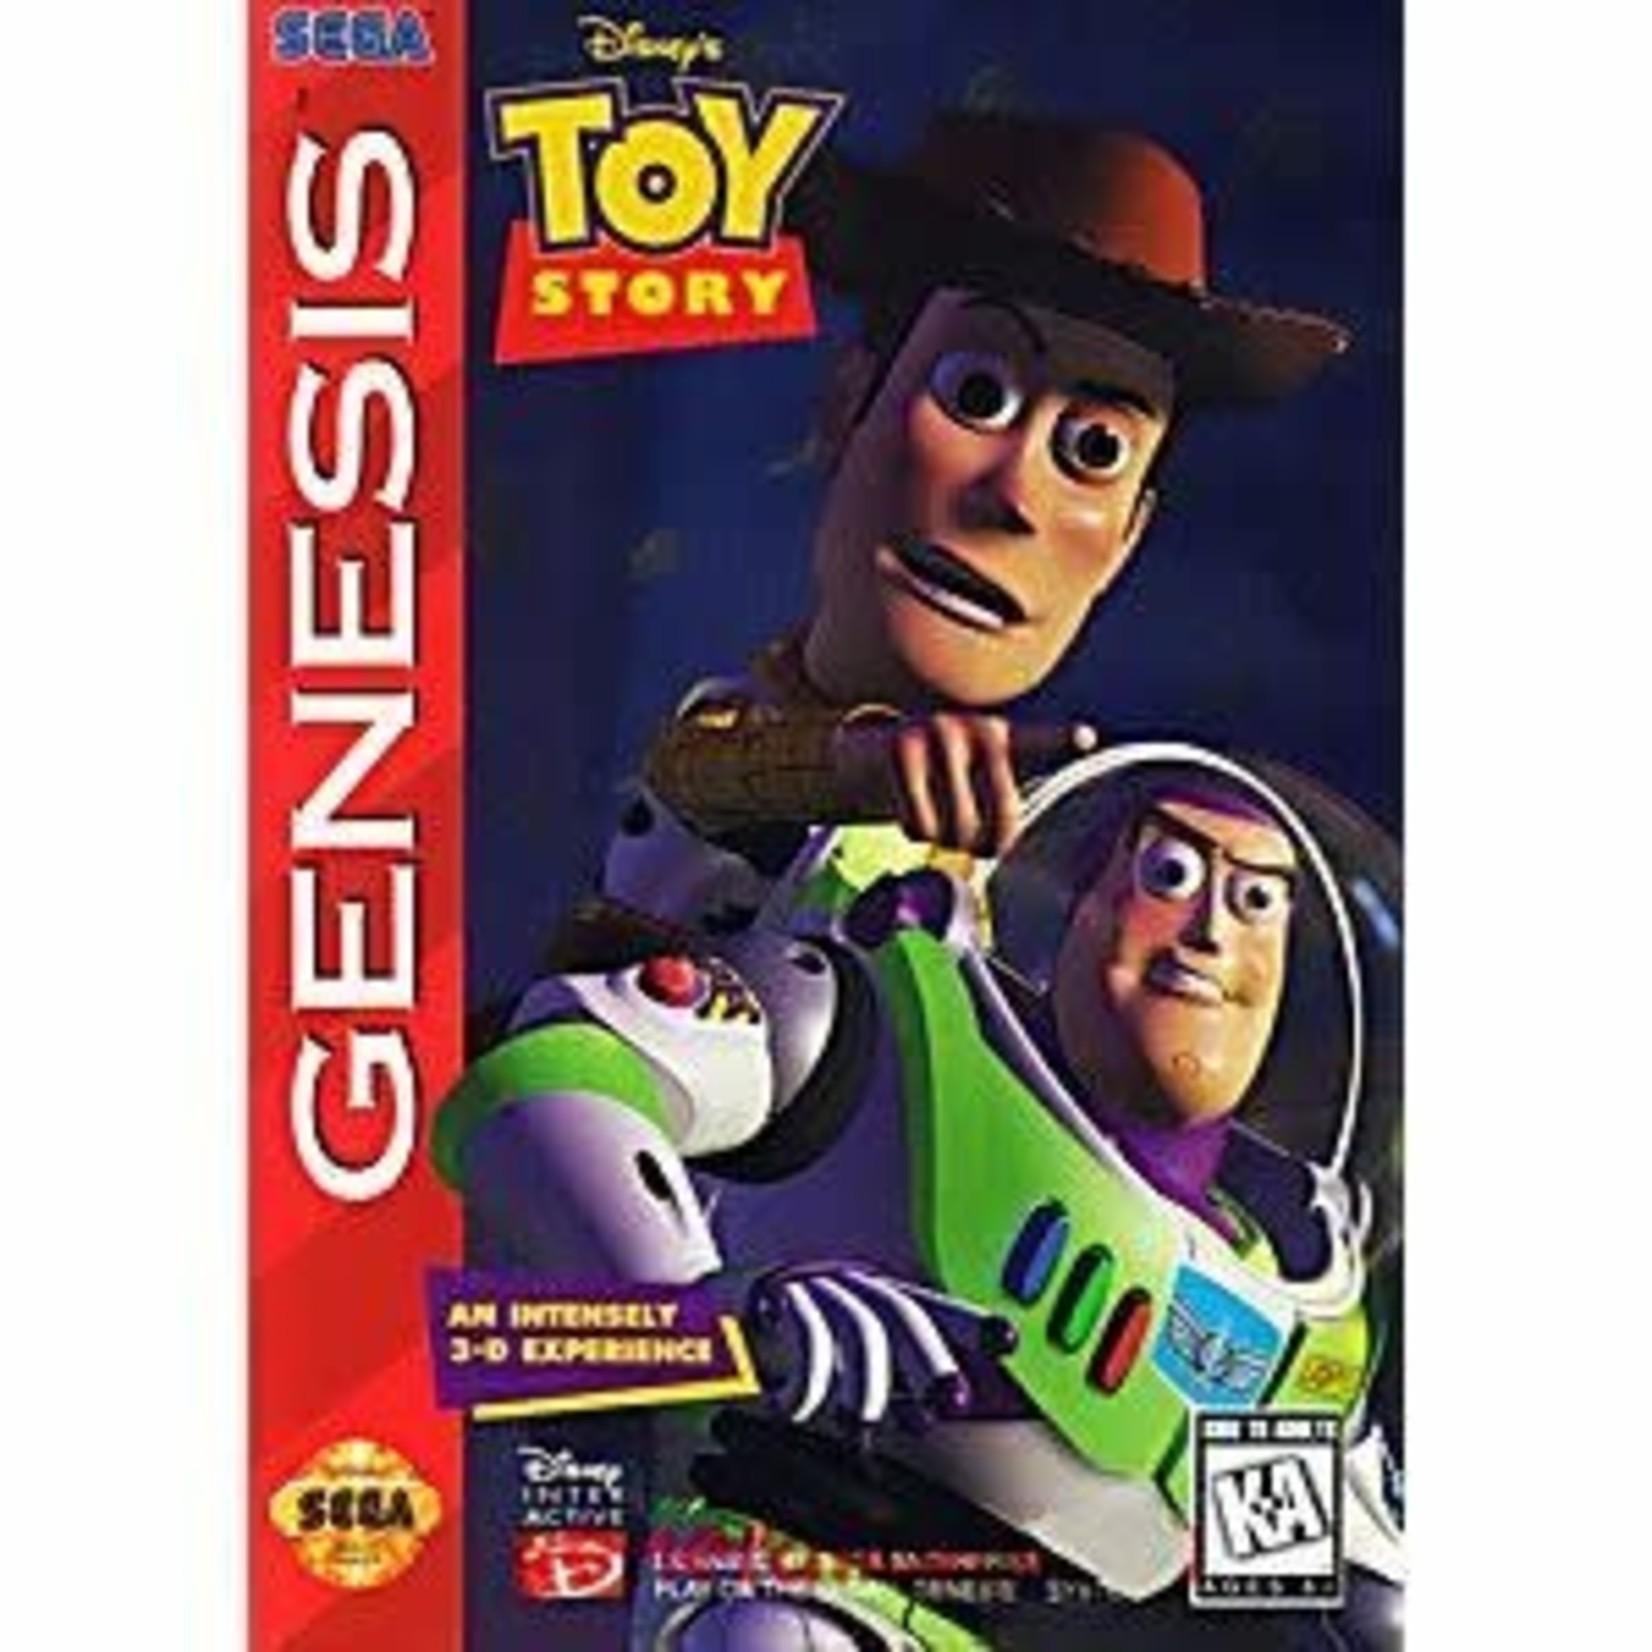 sgu-Toy Story (inbox)